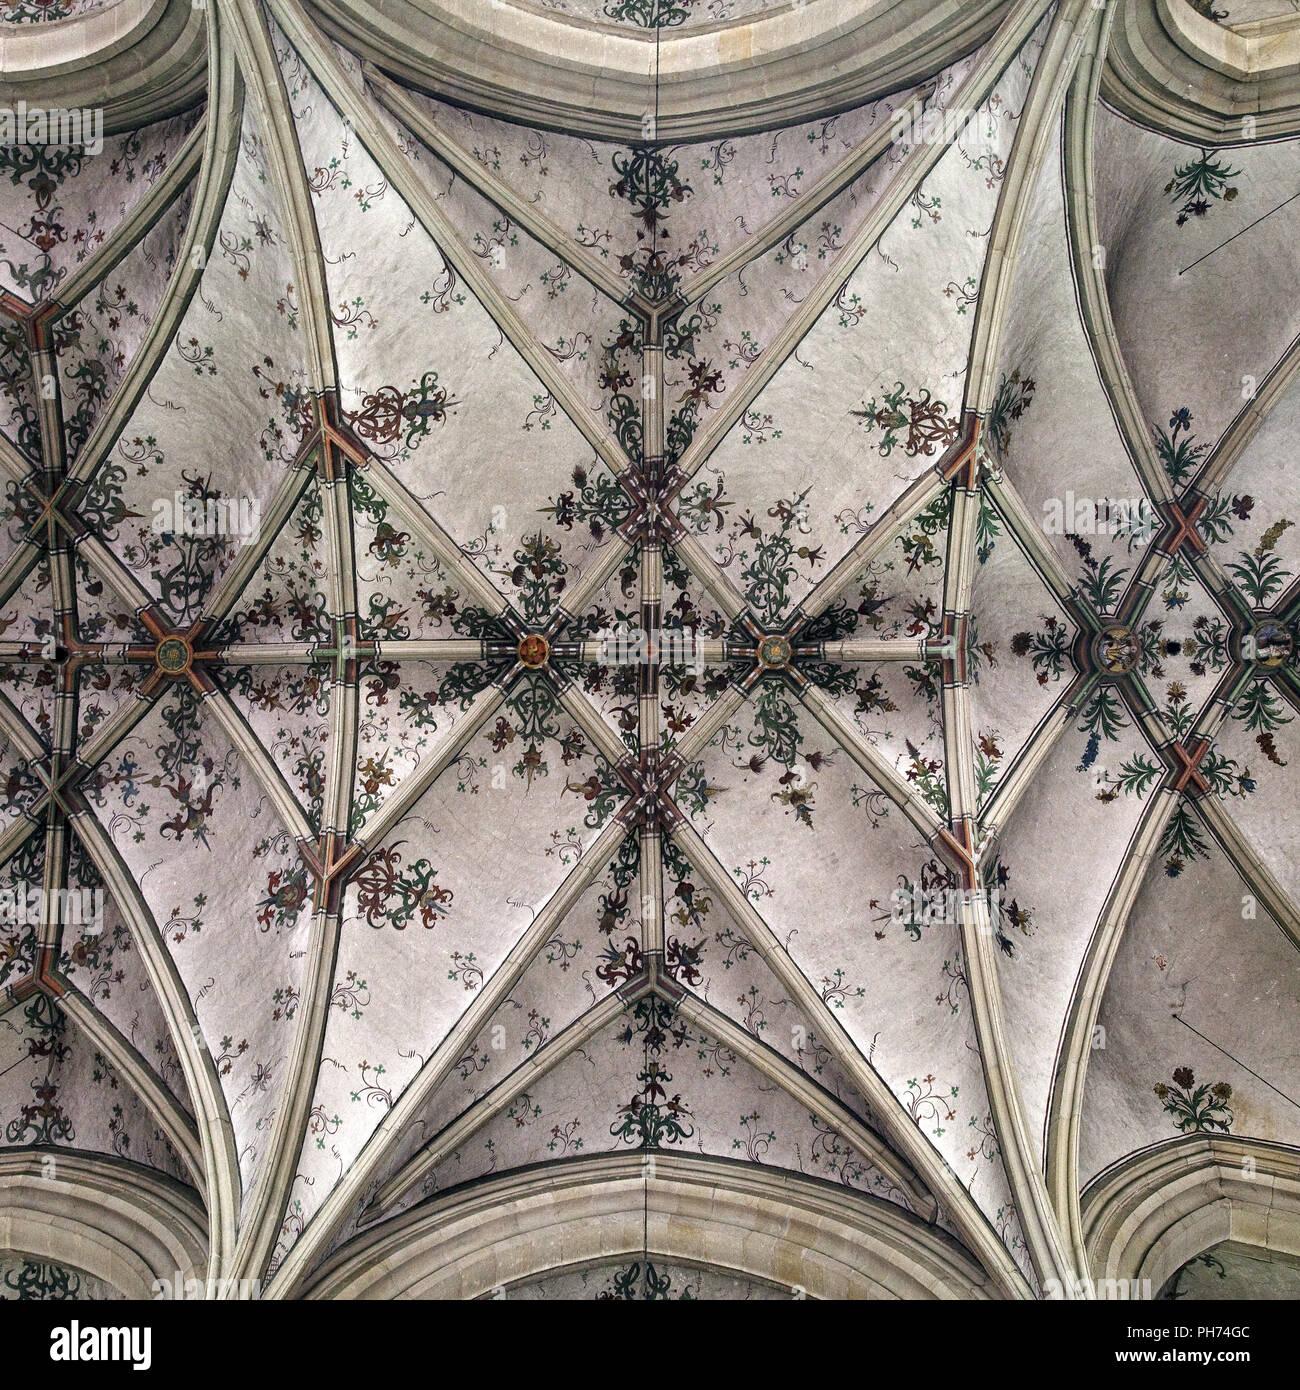 Ceiling, parish church, Nottuln, Germany - Stock Image